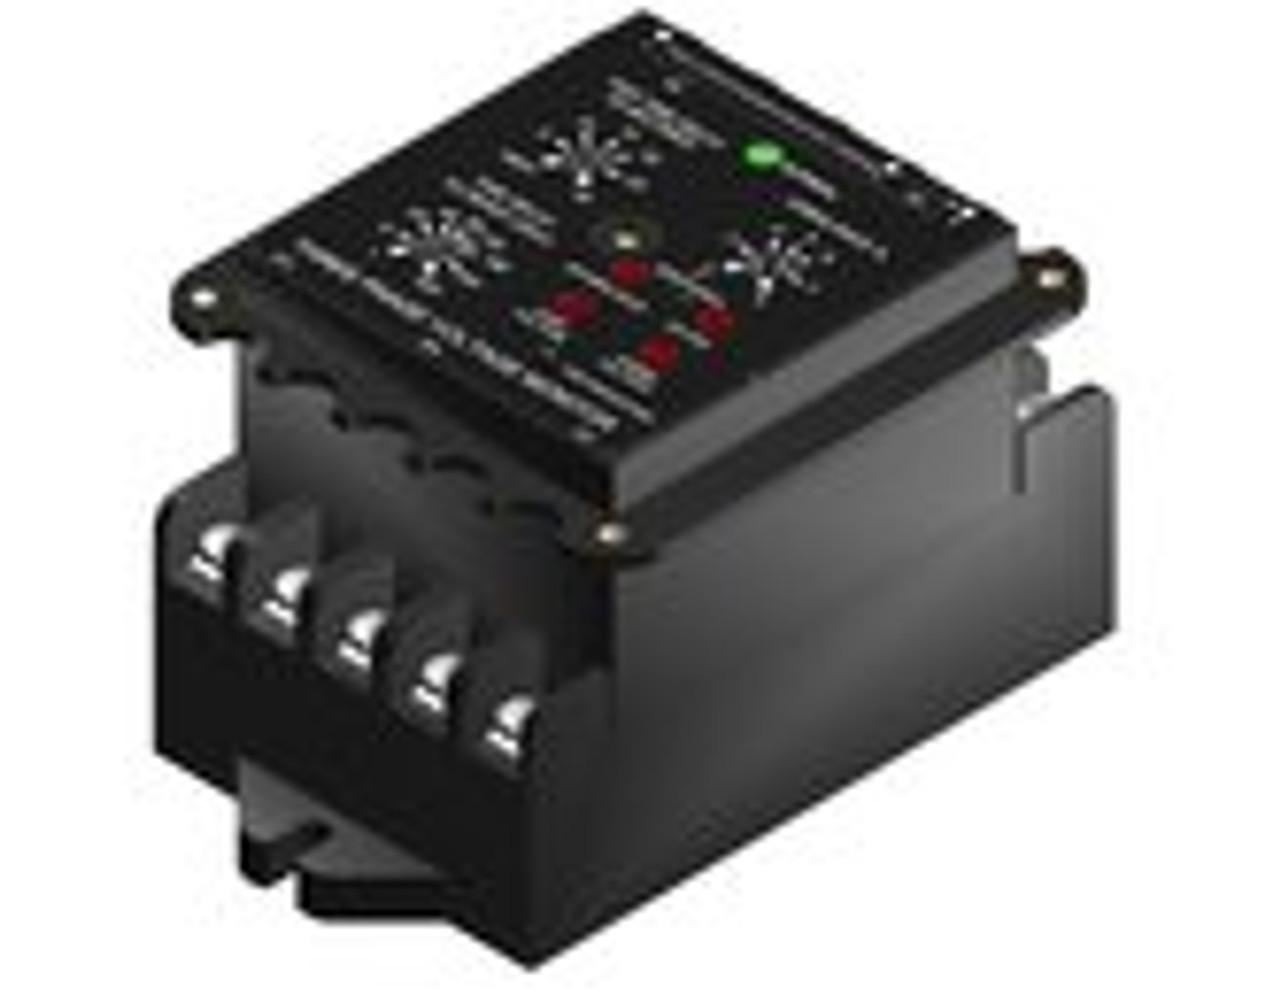 Electromagnetic Industries 3 Phase Voltage Monitor SPVR 208/SPVR2-208